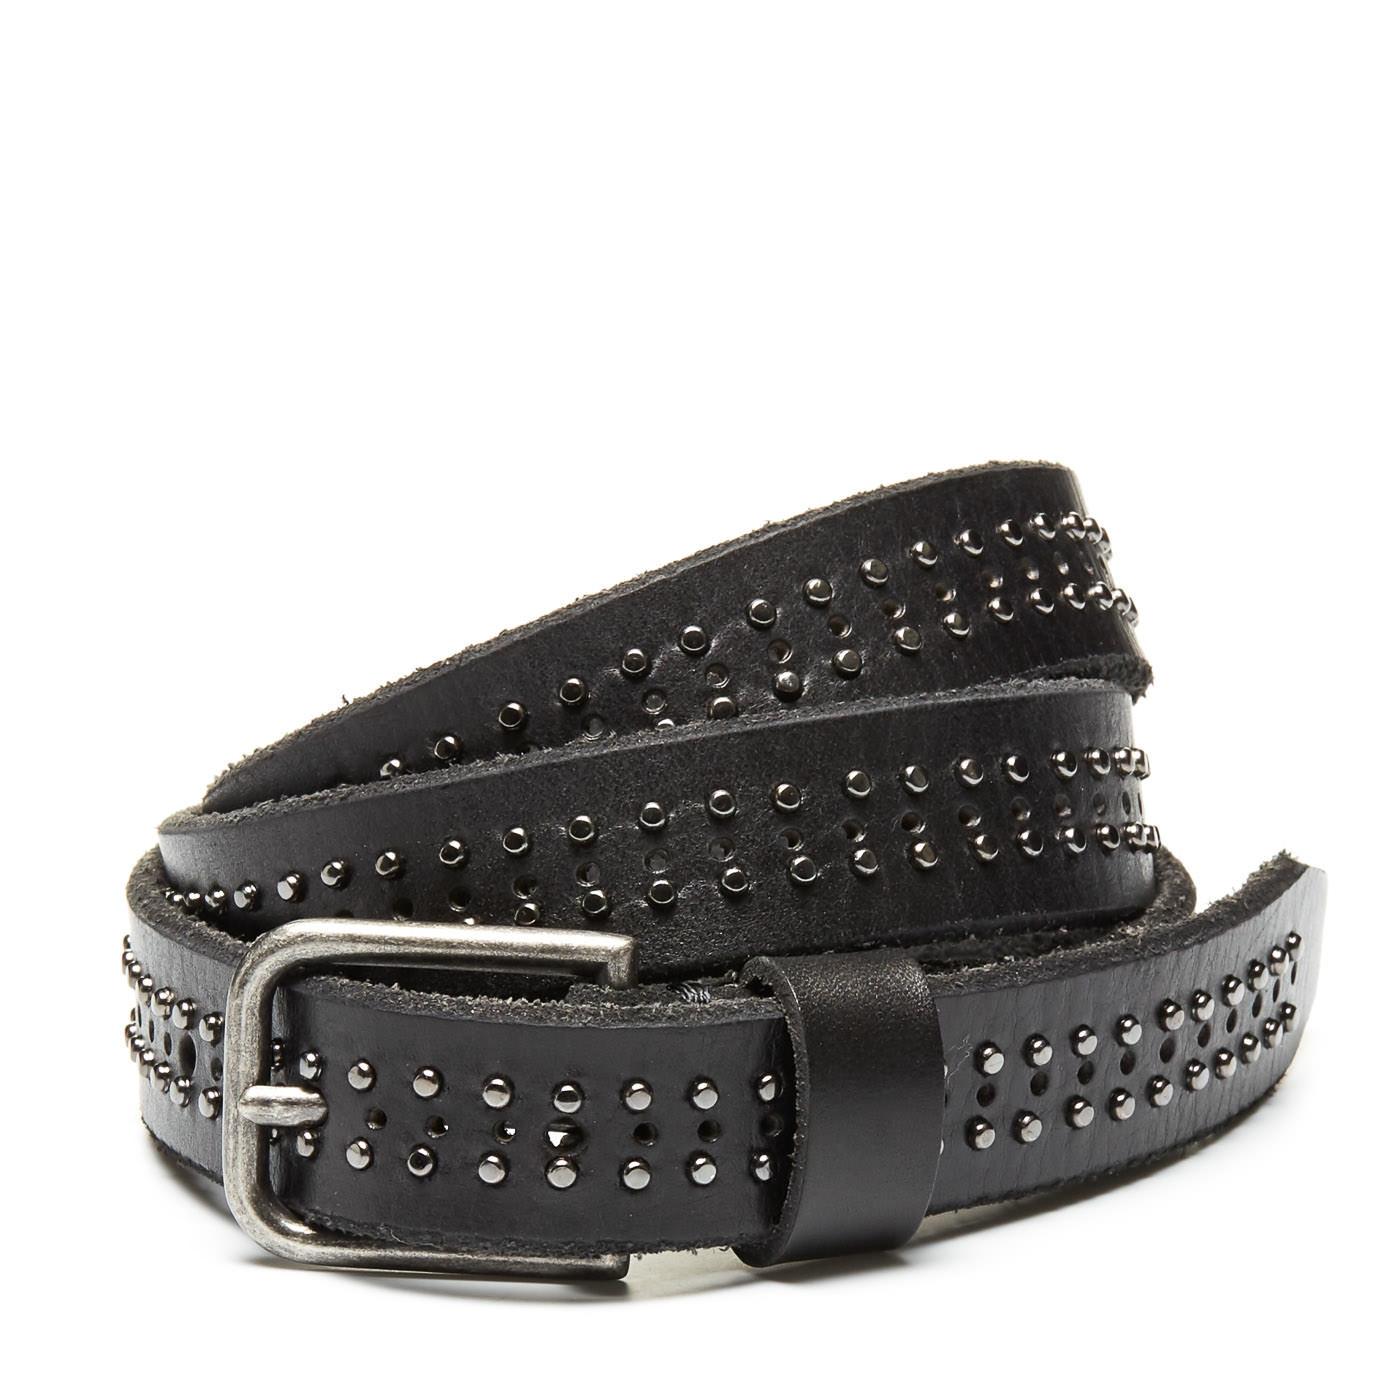 Cowboysbelt Black Dames Riem 259119-000100